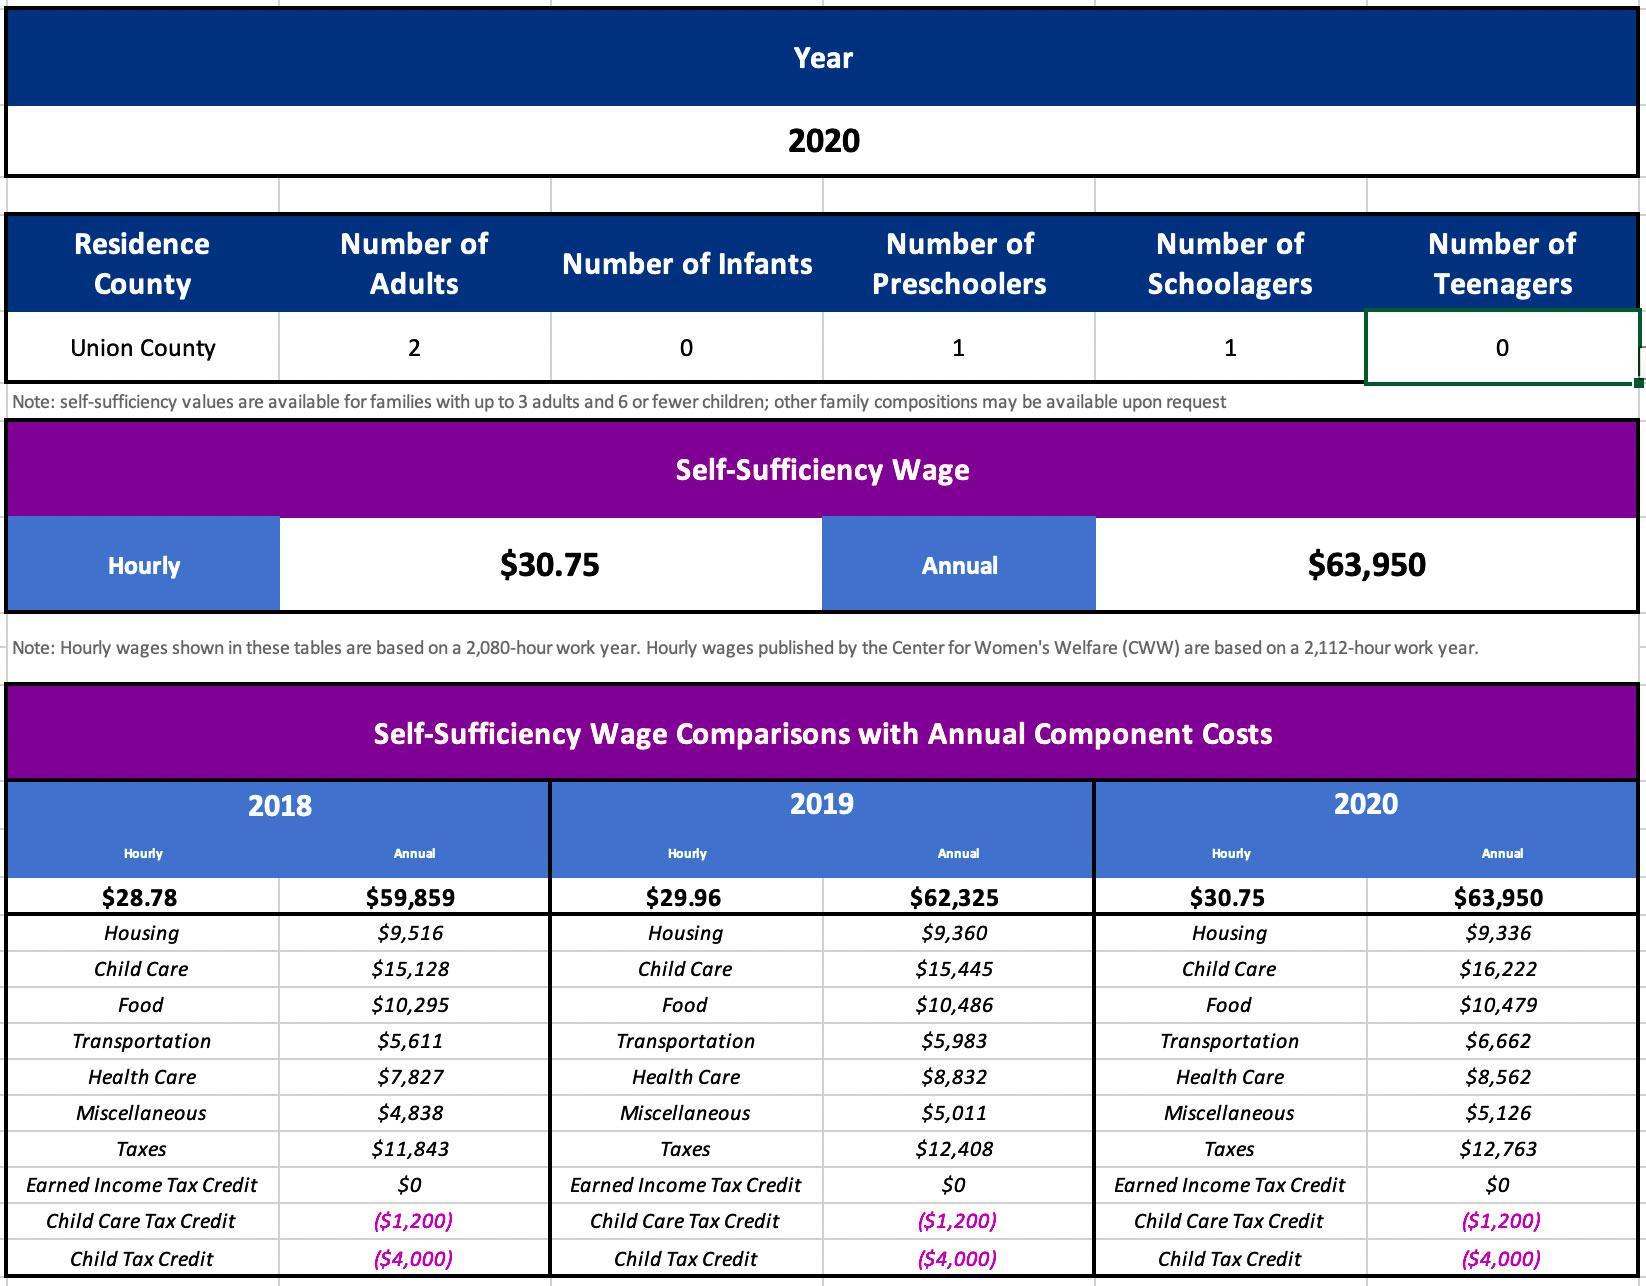 Self-Sufficiency Data